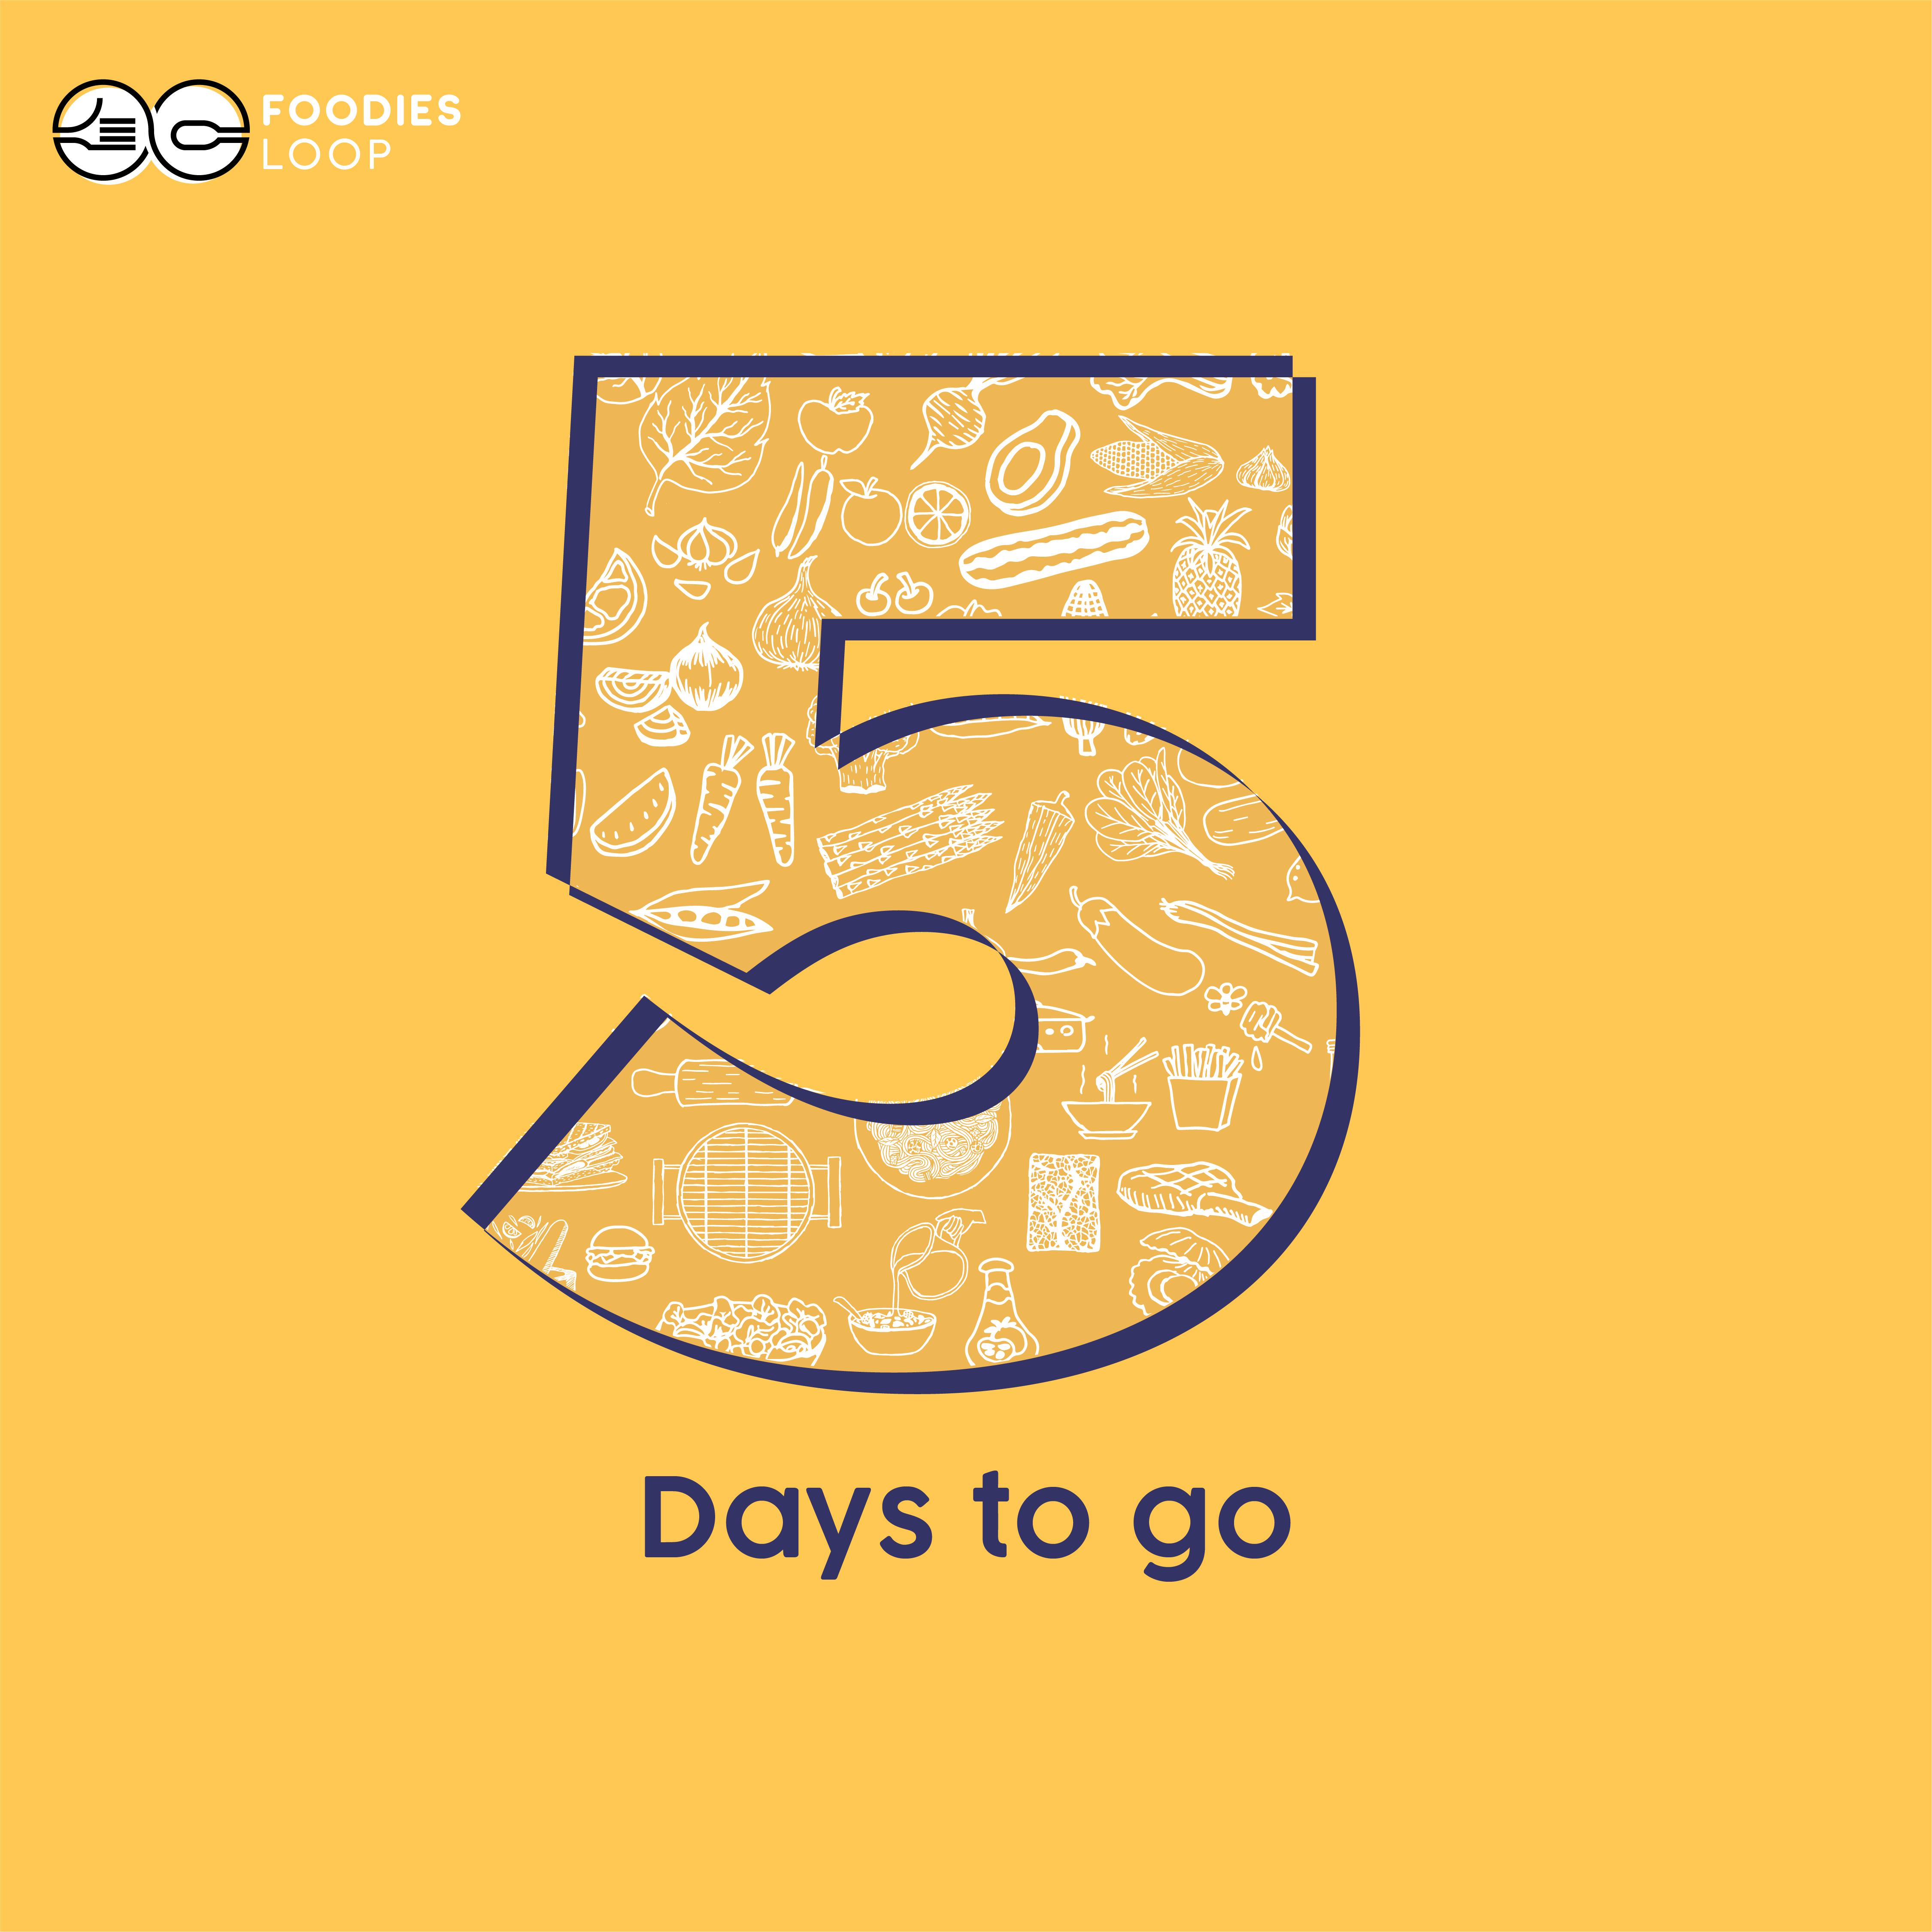 5 Days 2 Go Concept Store Art World Brand Marketing